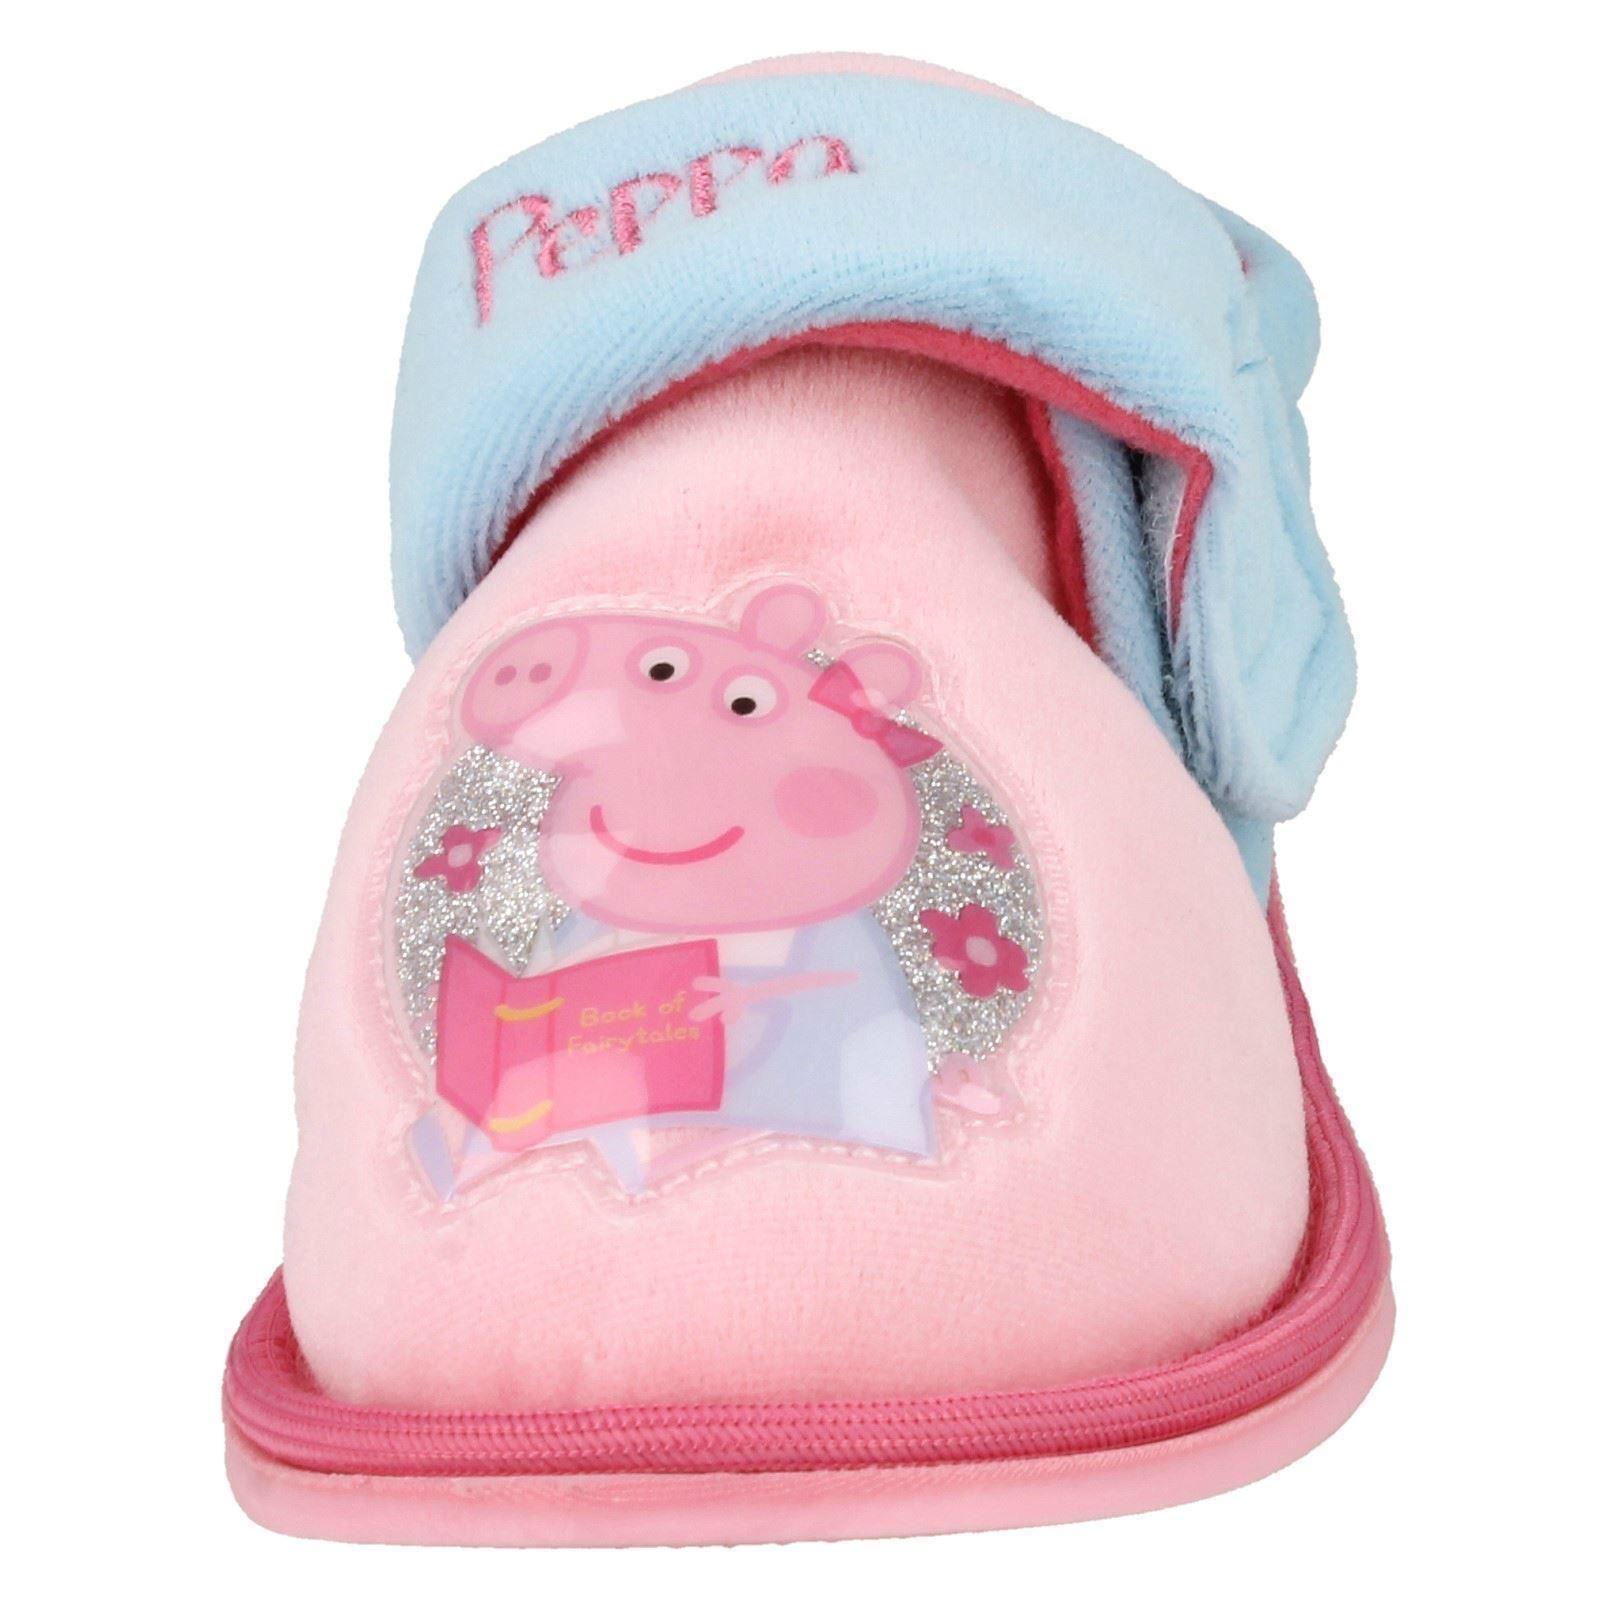 Chicas Personaje Peppa Pig athilda Slipper